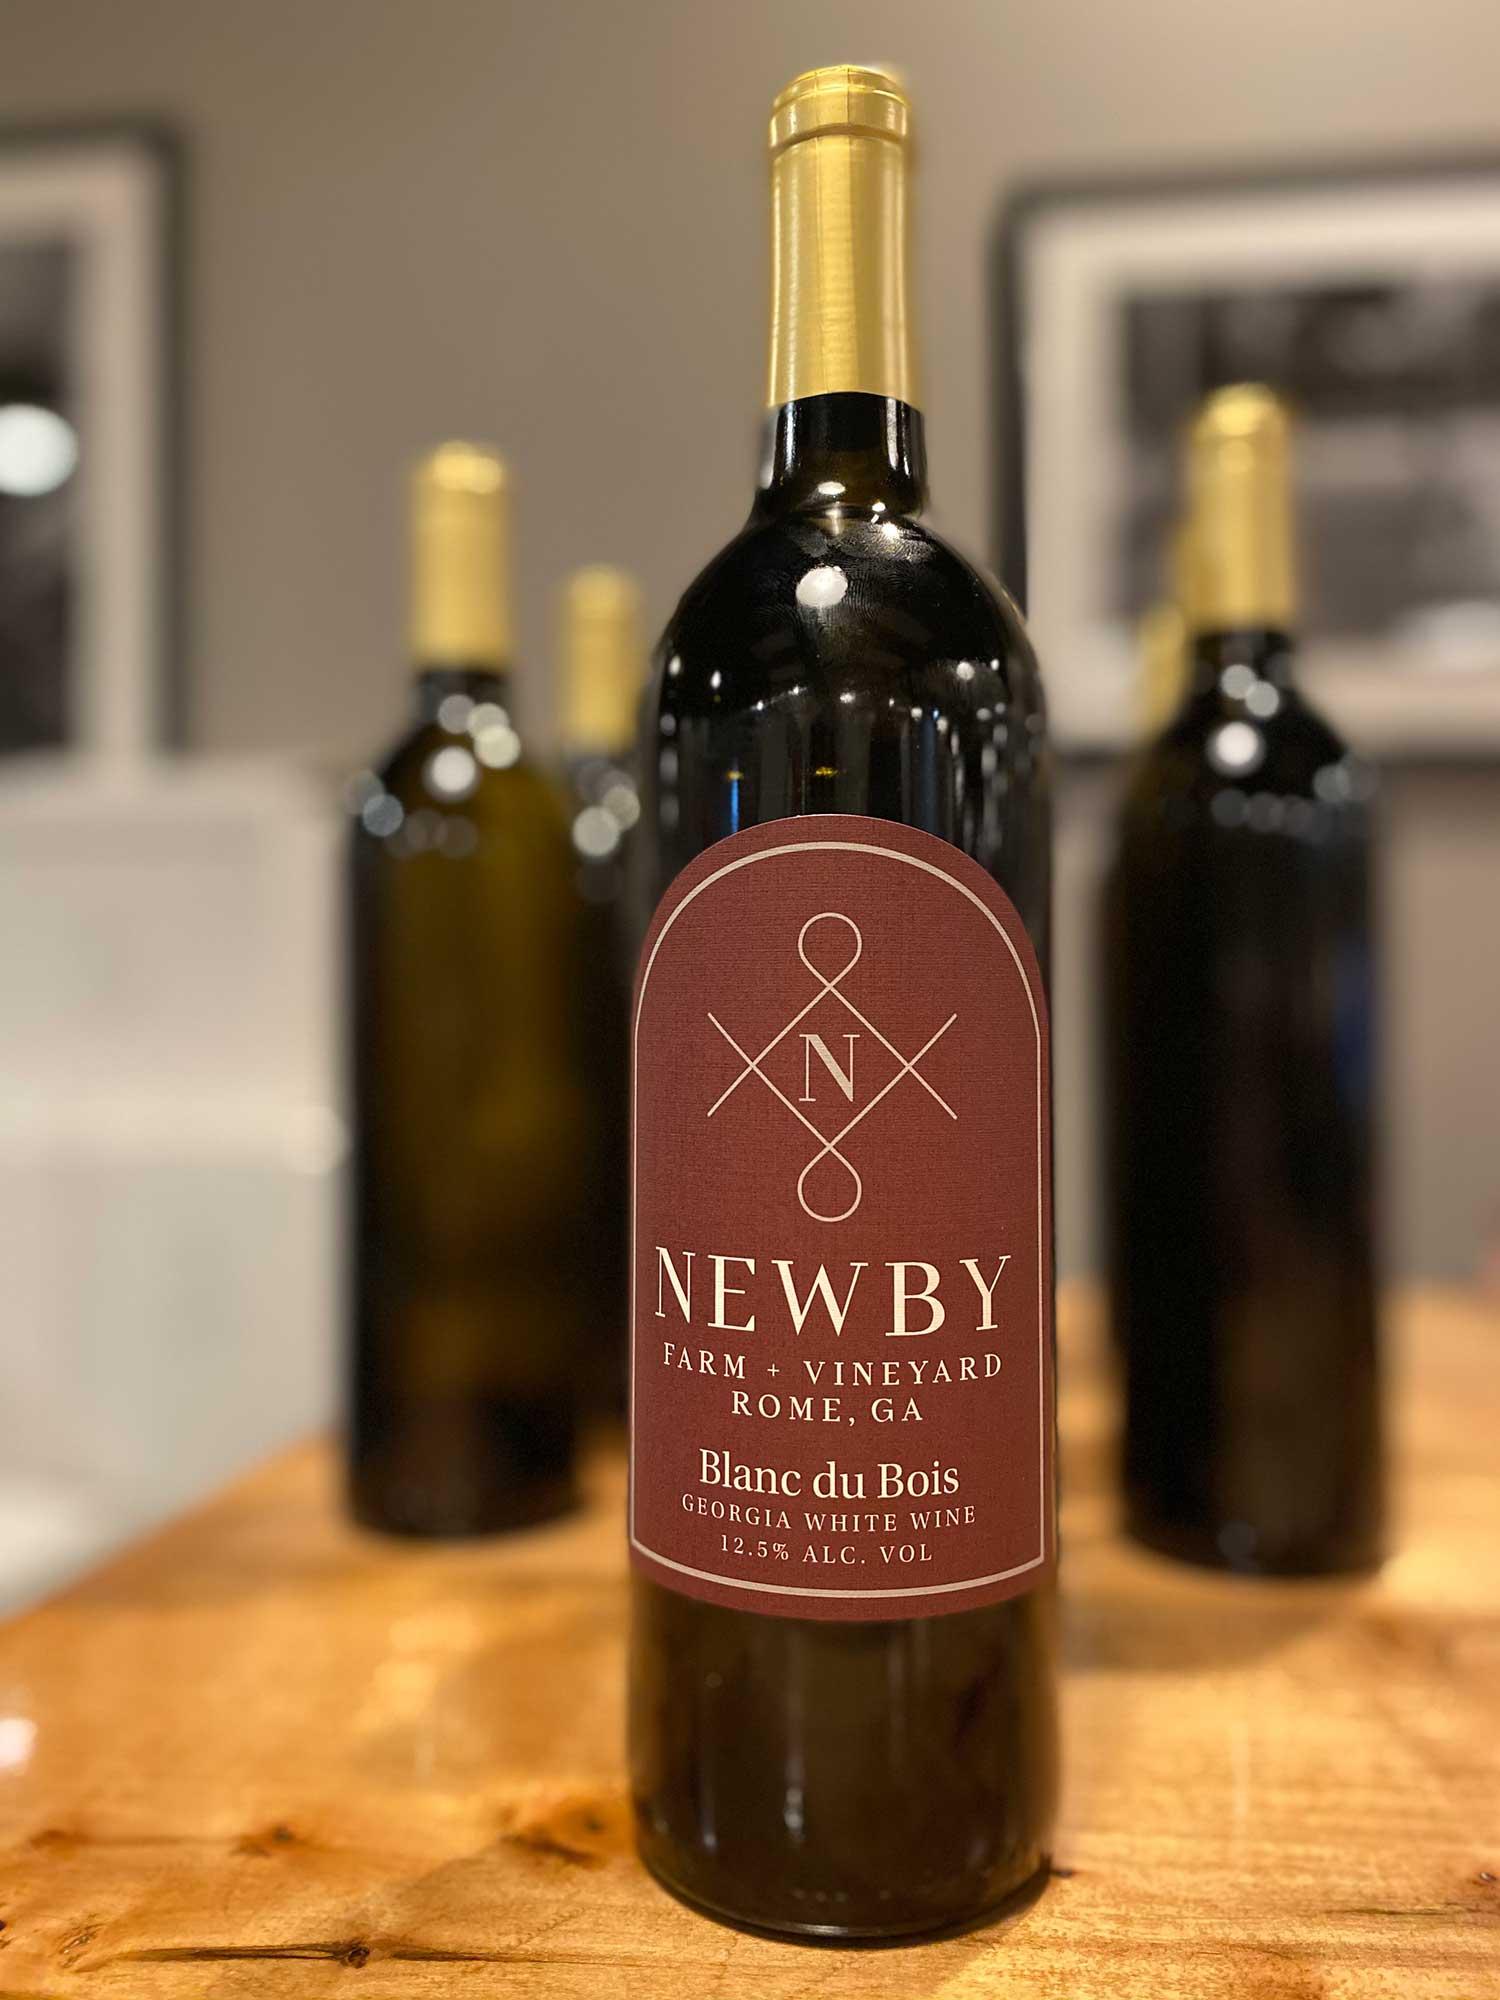 A bottle of Newby wine